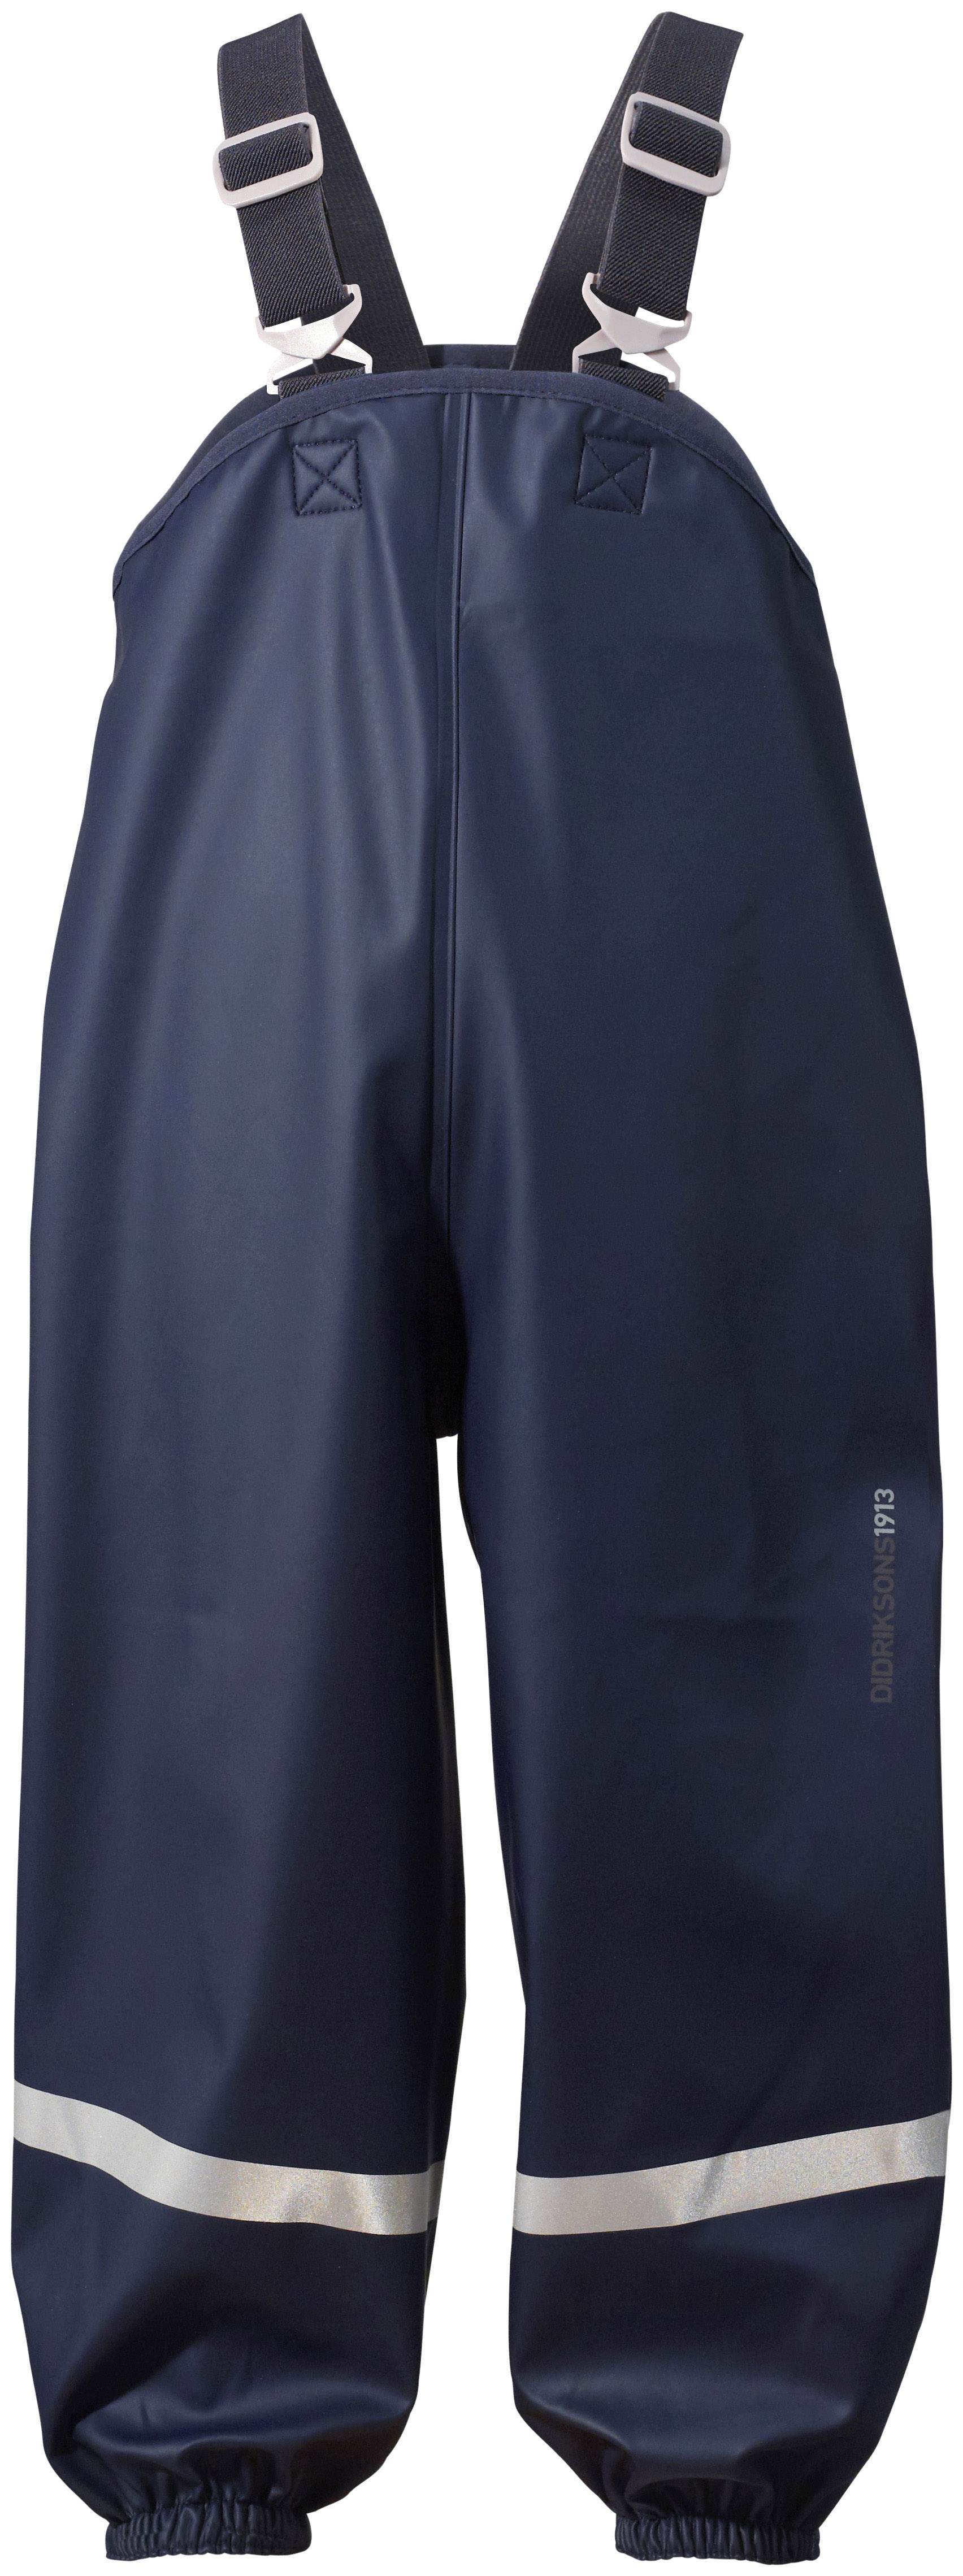 штаны непромокайка